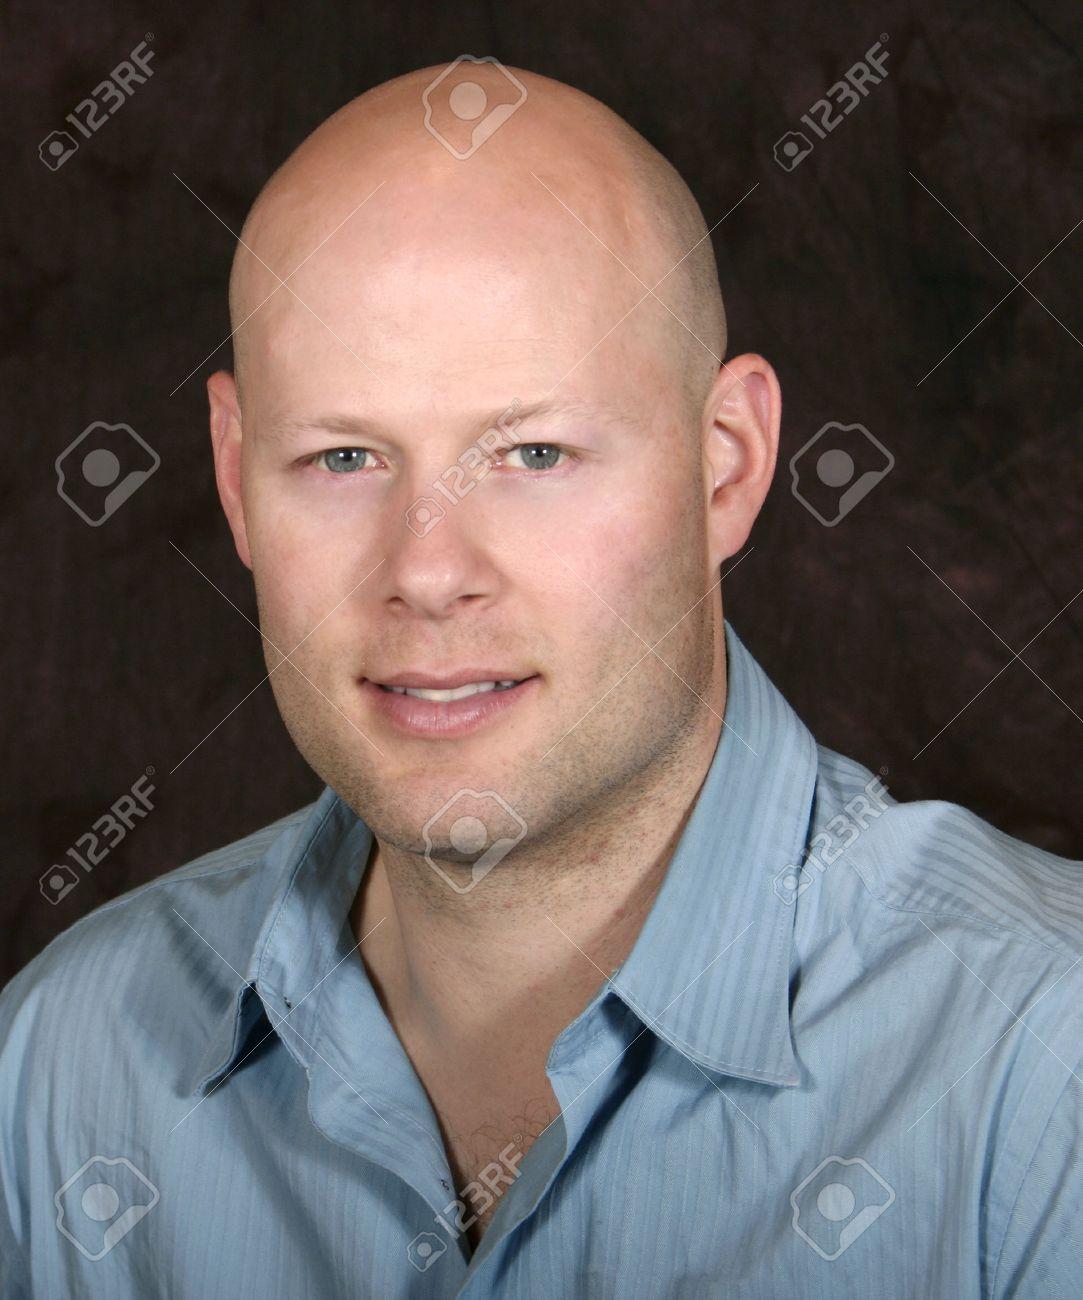 head shot of a young goodlooking bald man - 1686769